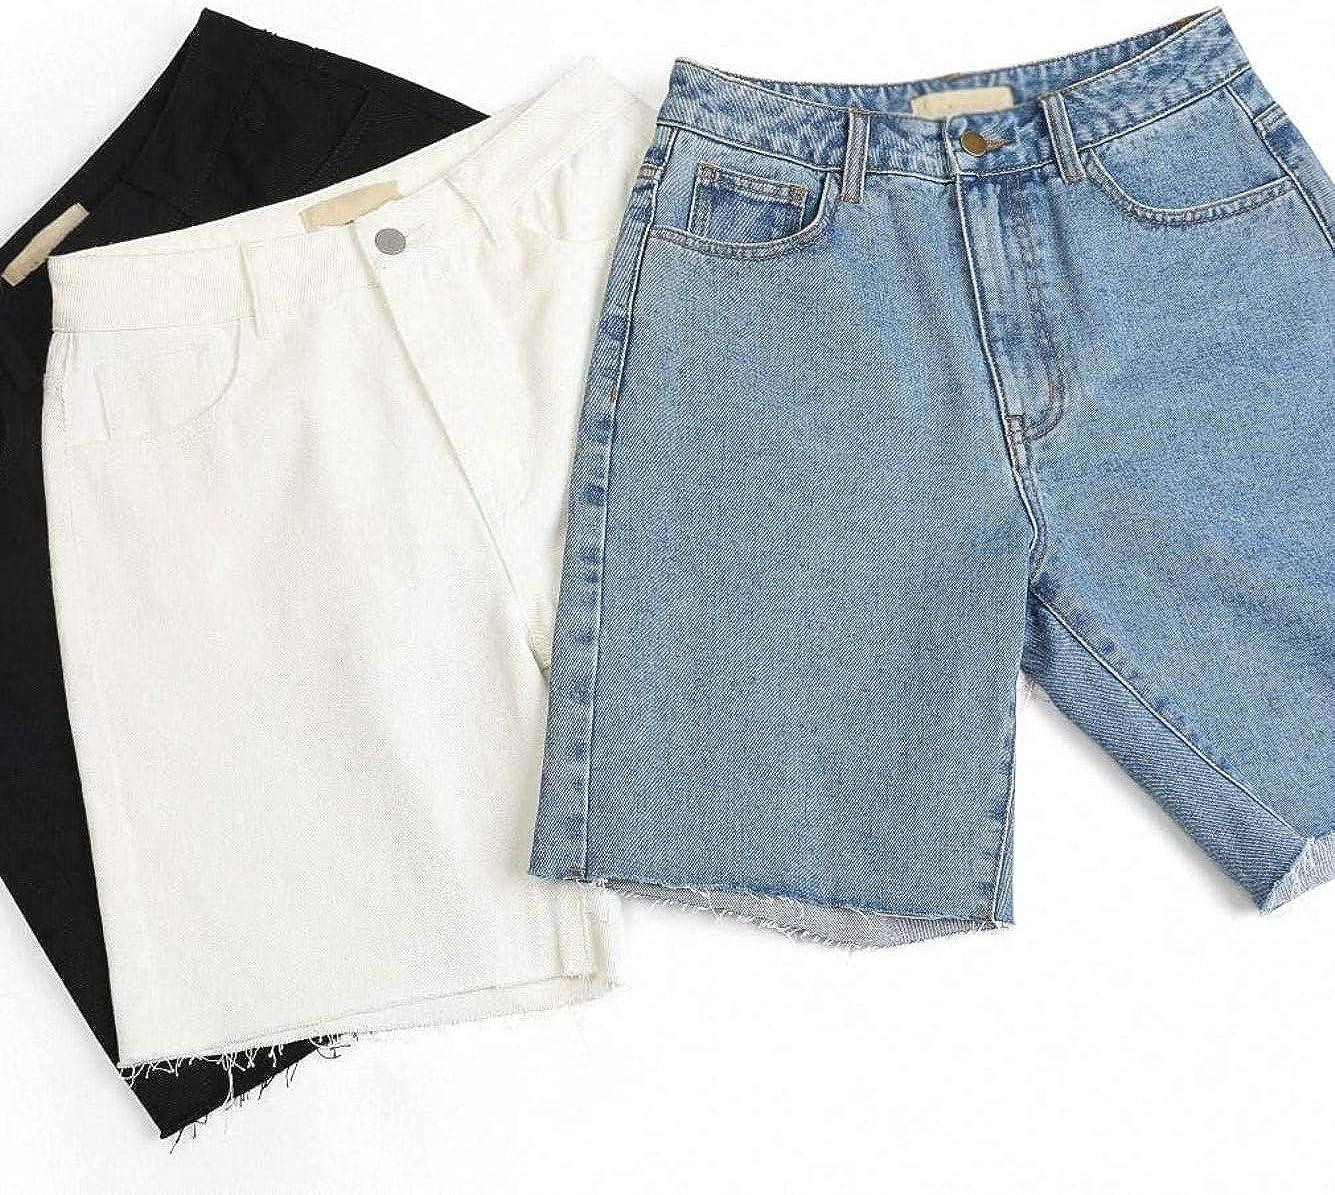 Rsqsjgkert Blue High Waist Casual Denim Shorts Women Spring Pure Wide Leg Straight Ladies Daily Bottom